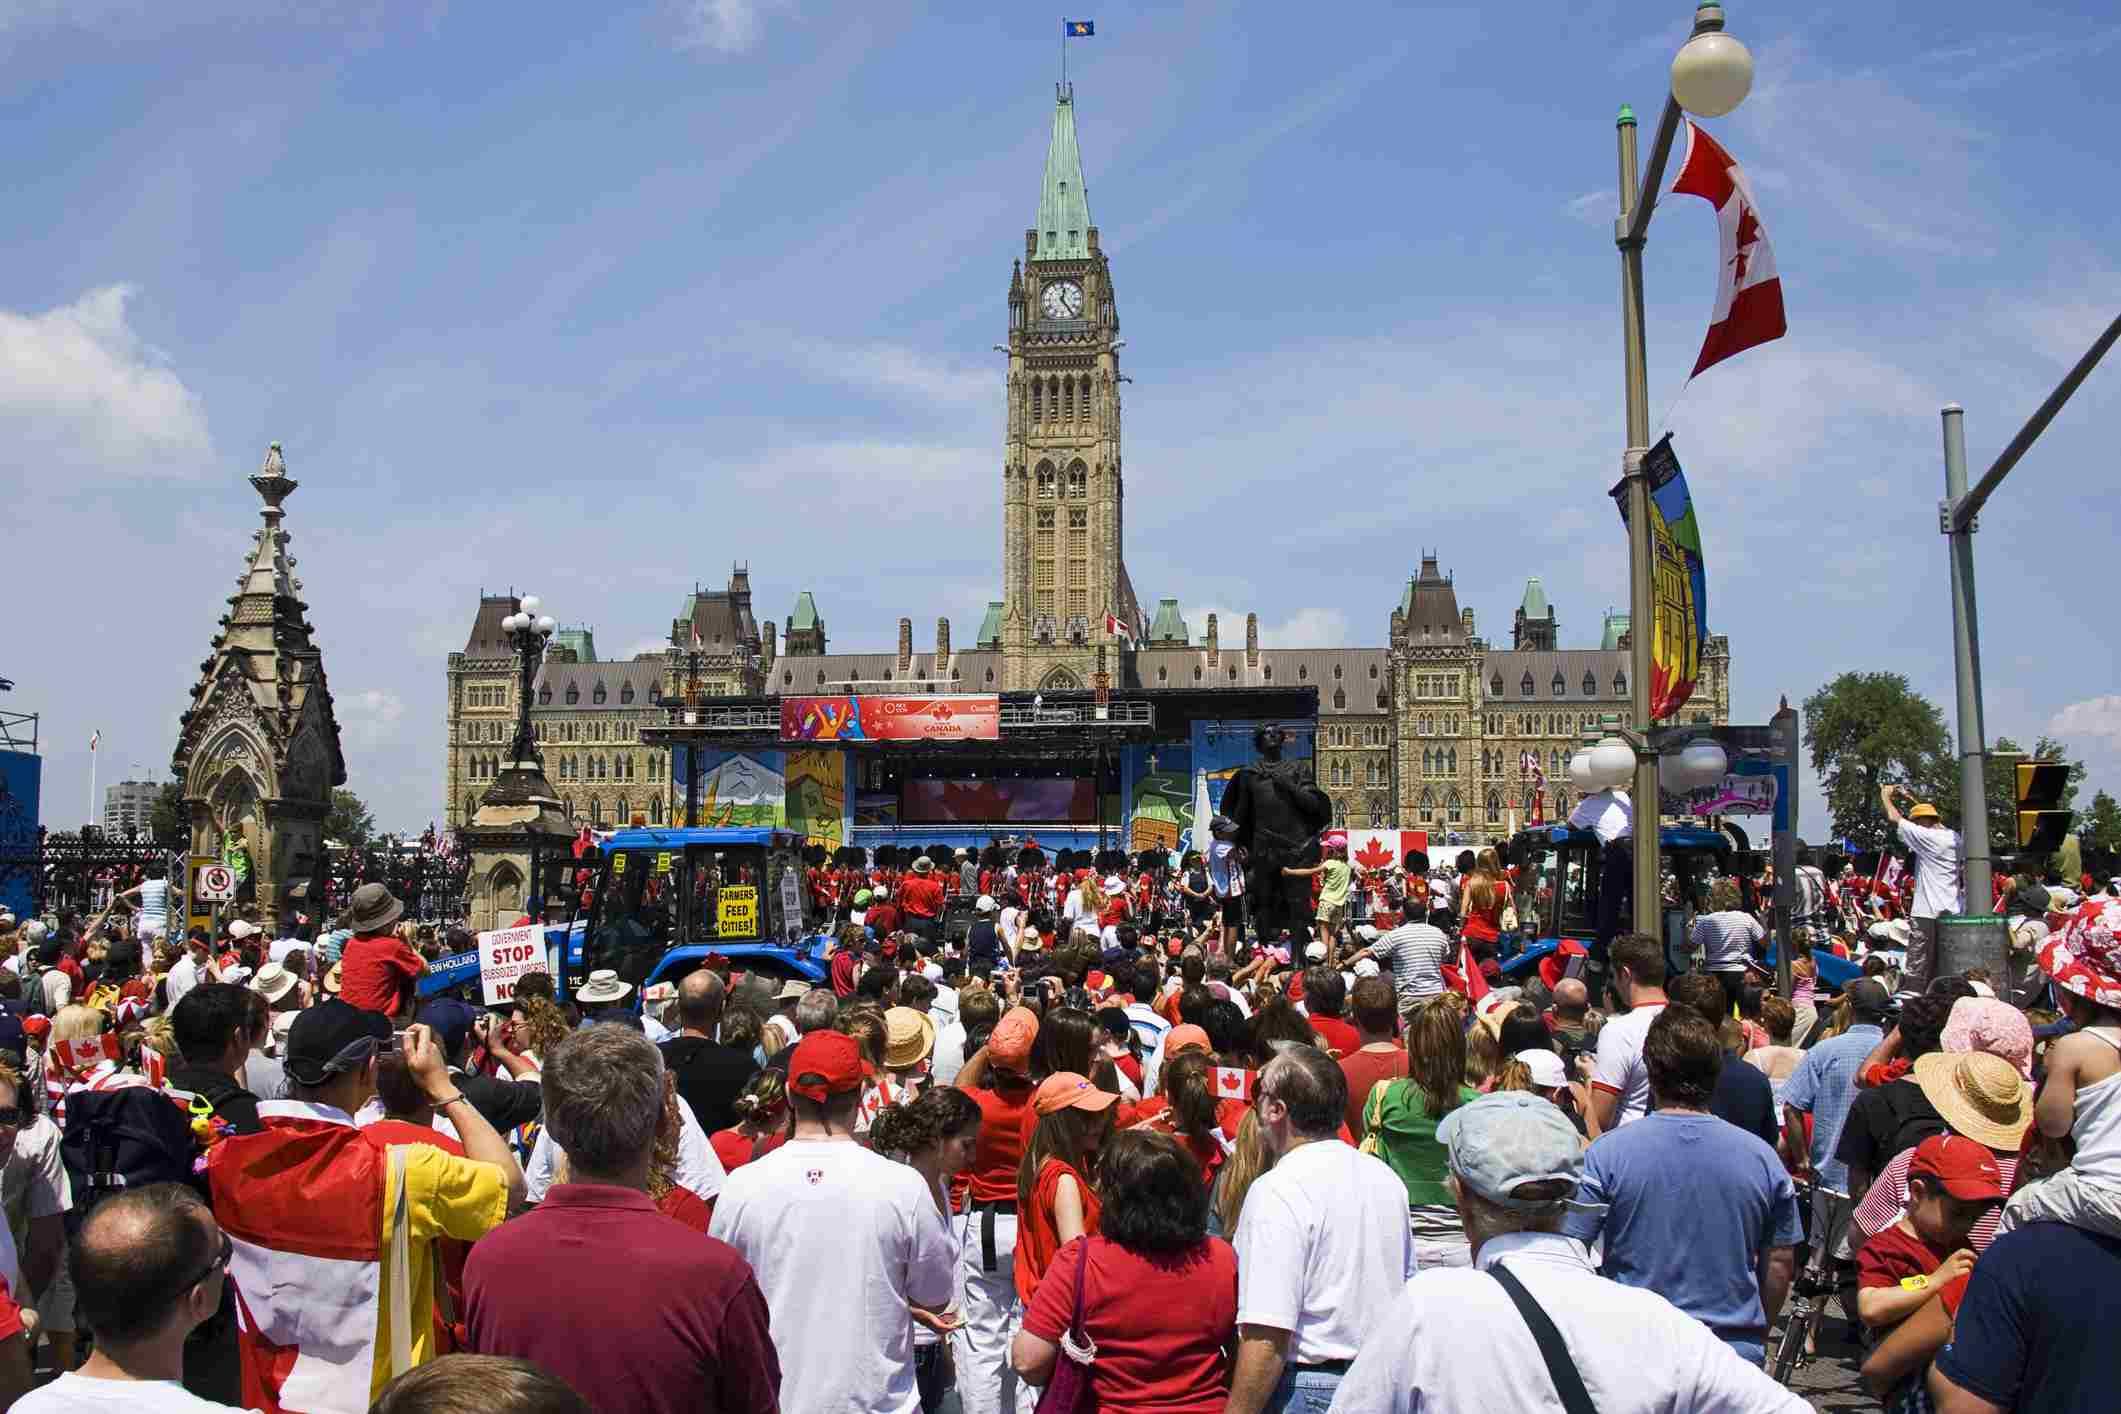 Celebrating Canada Day in Ottawa, Canada